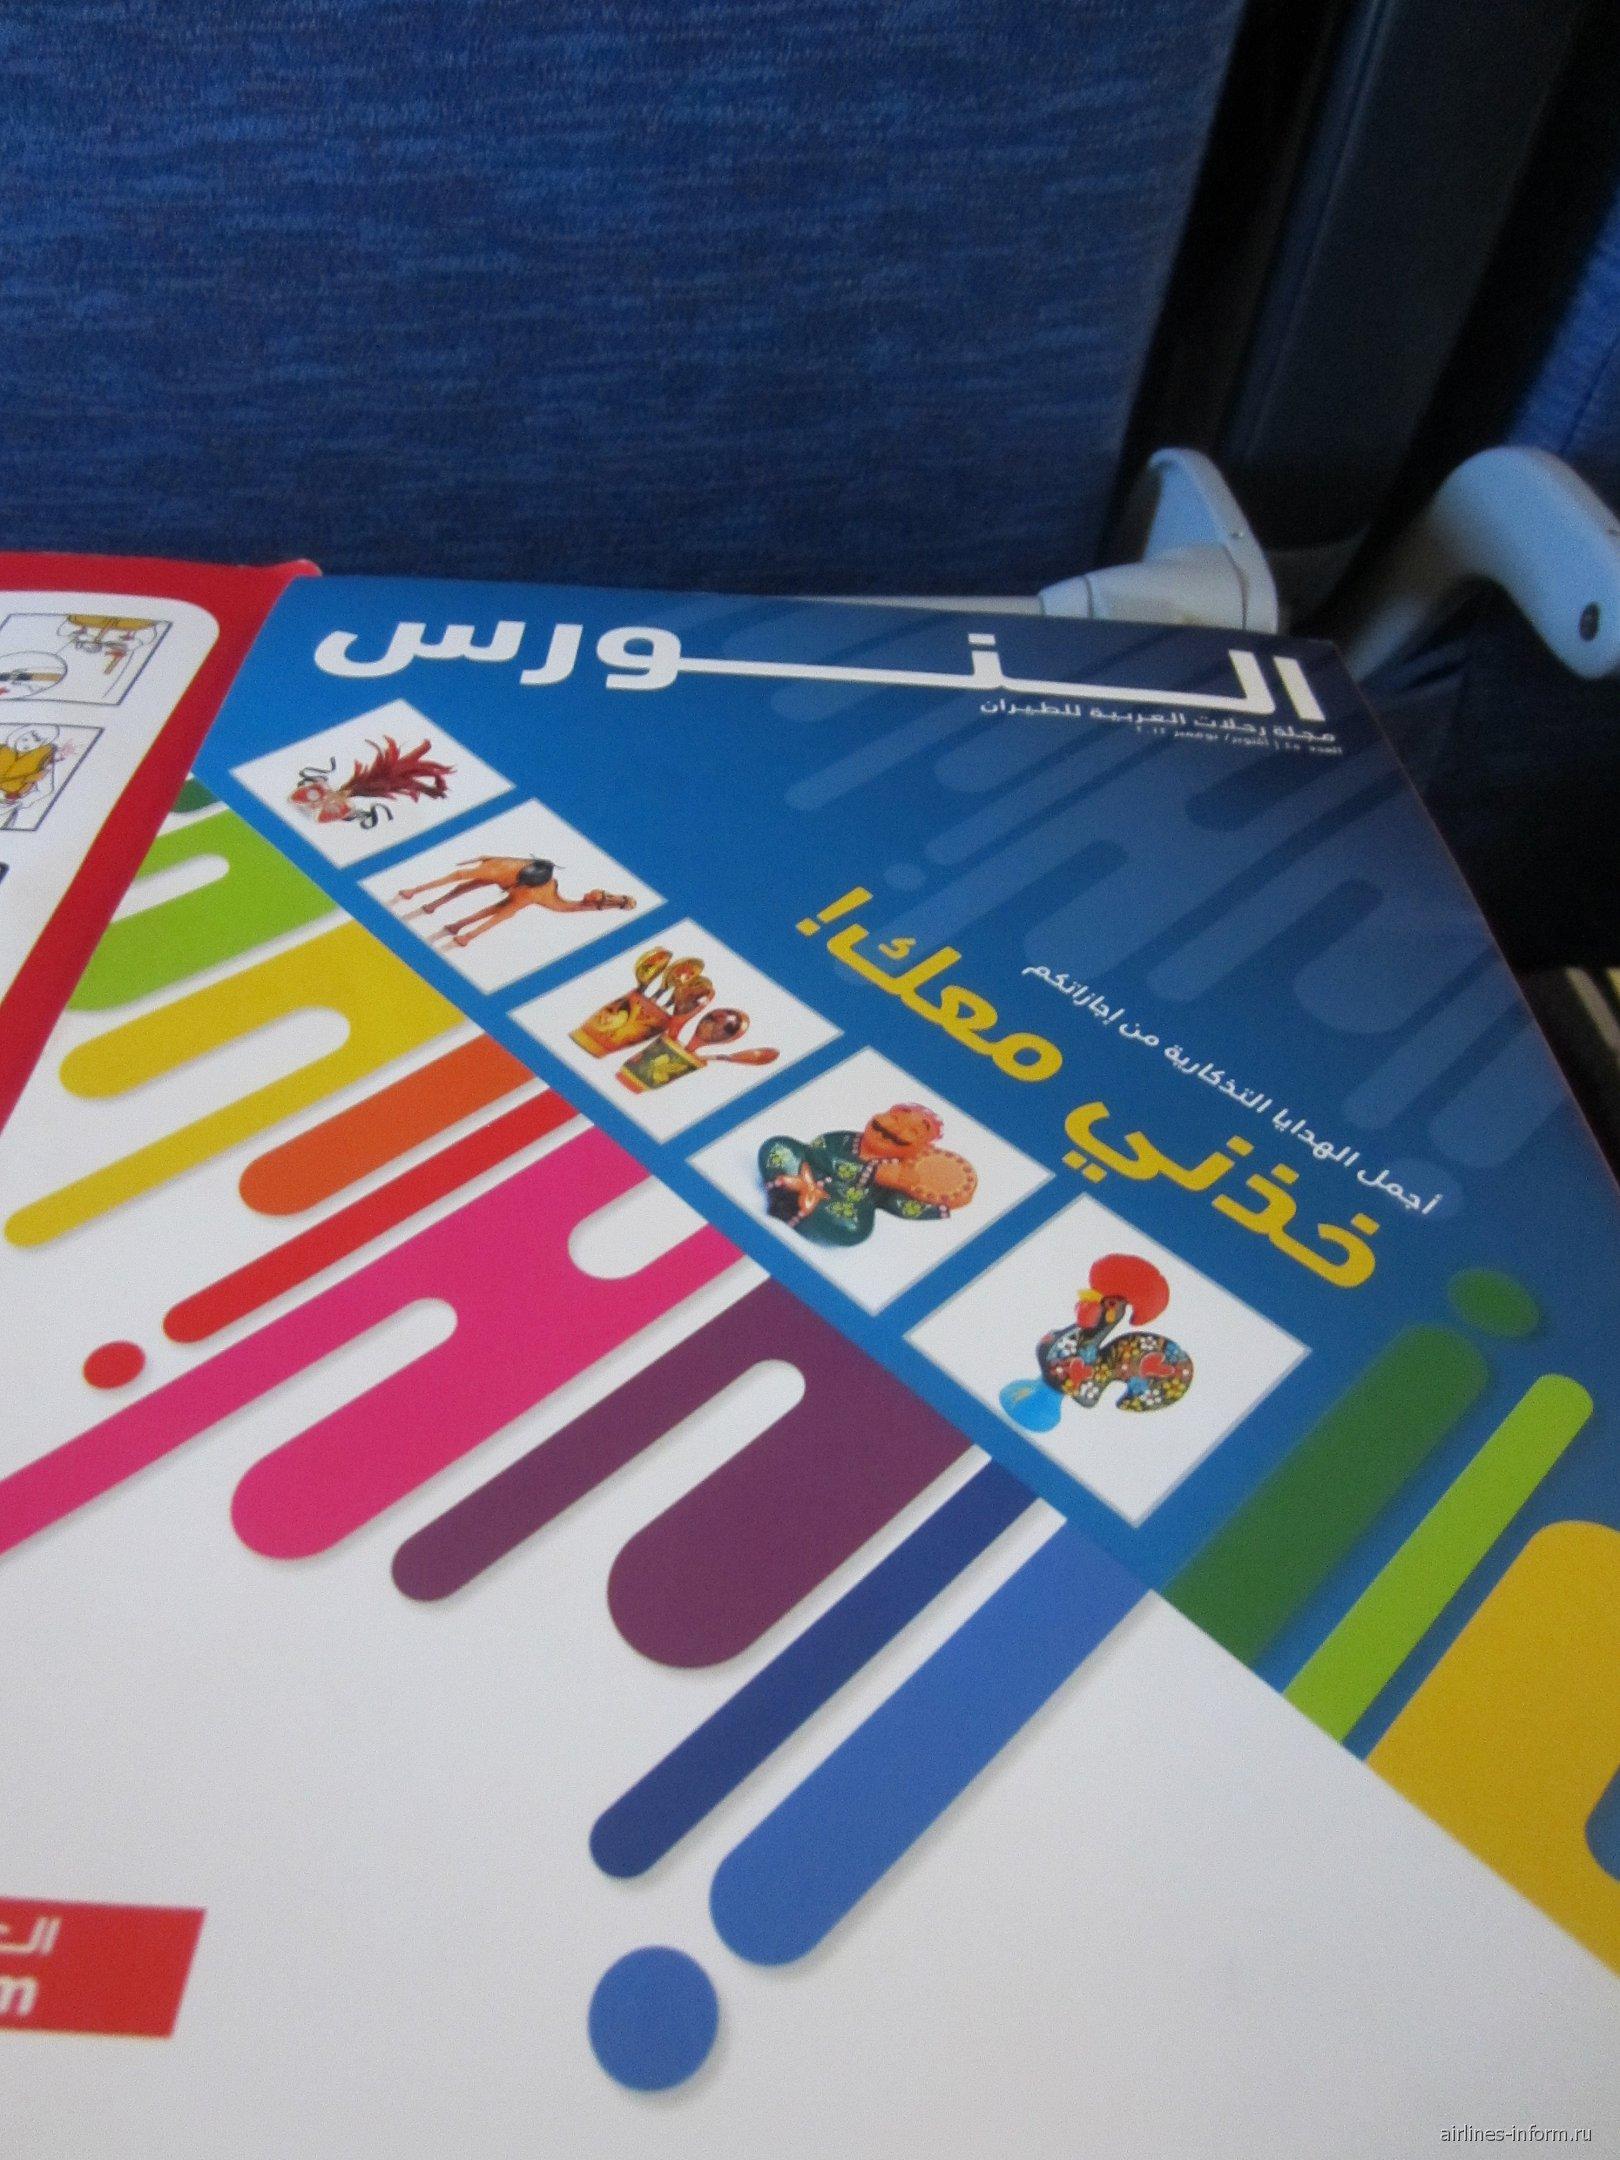 Журнал для пассажиров авиакомпании Air Arabia